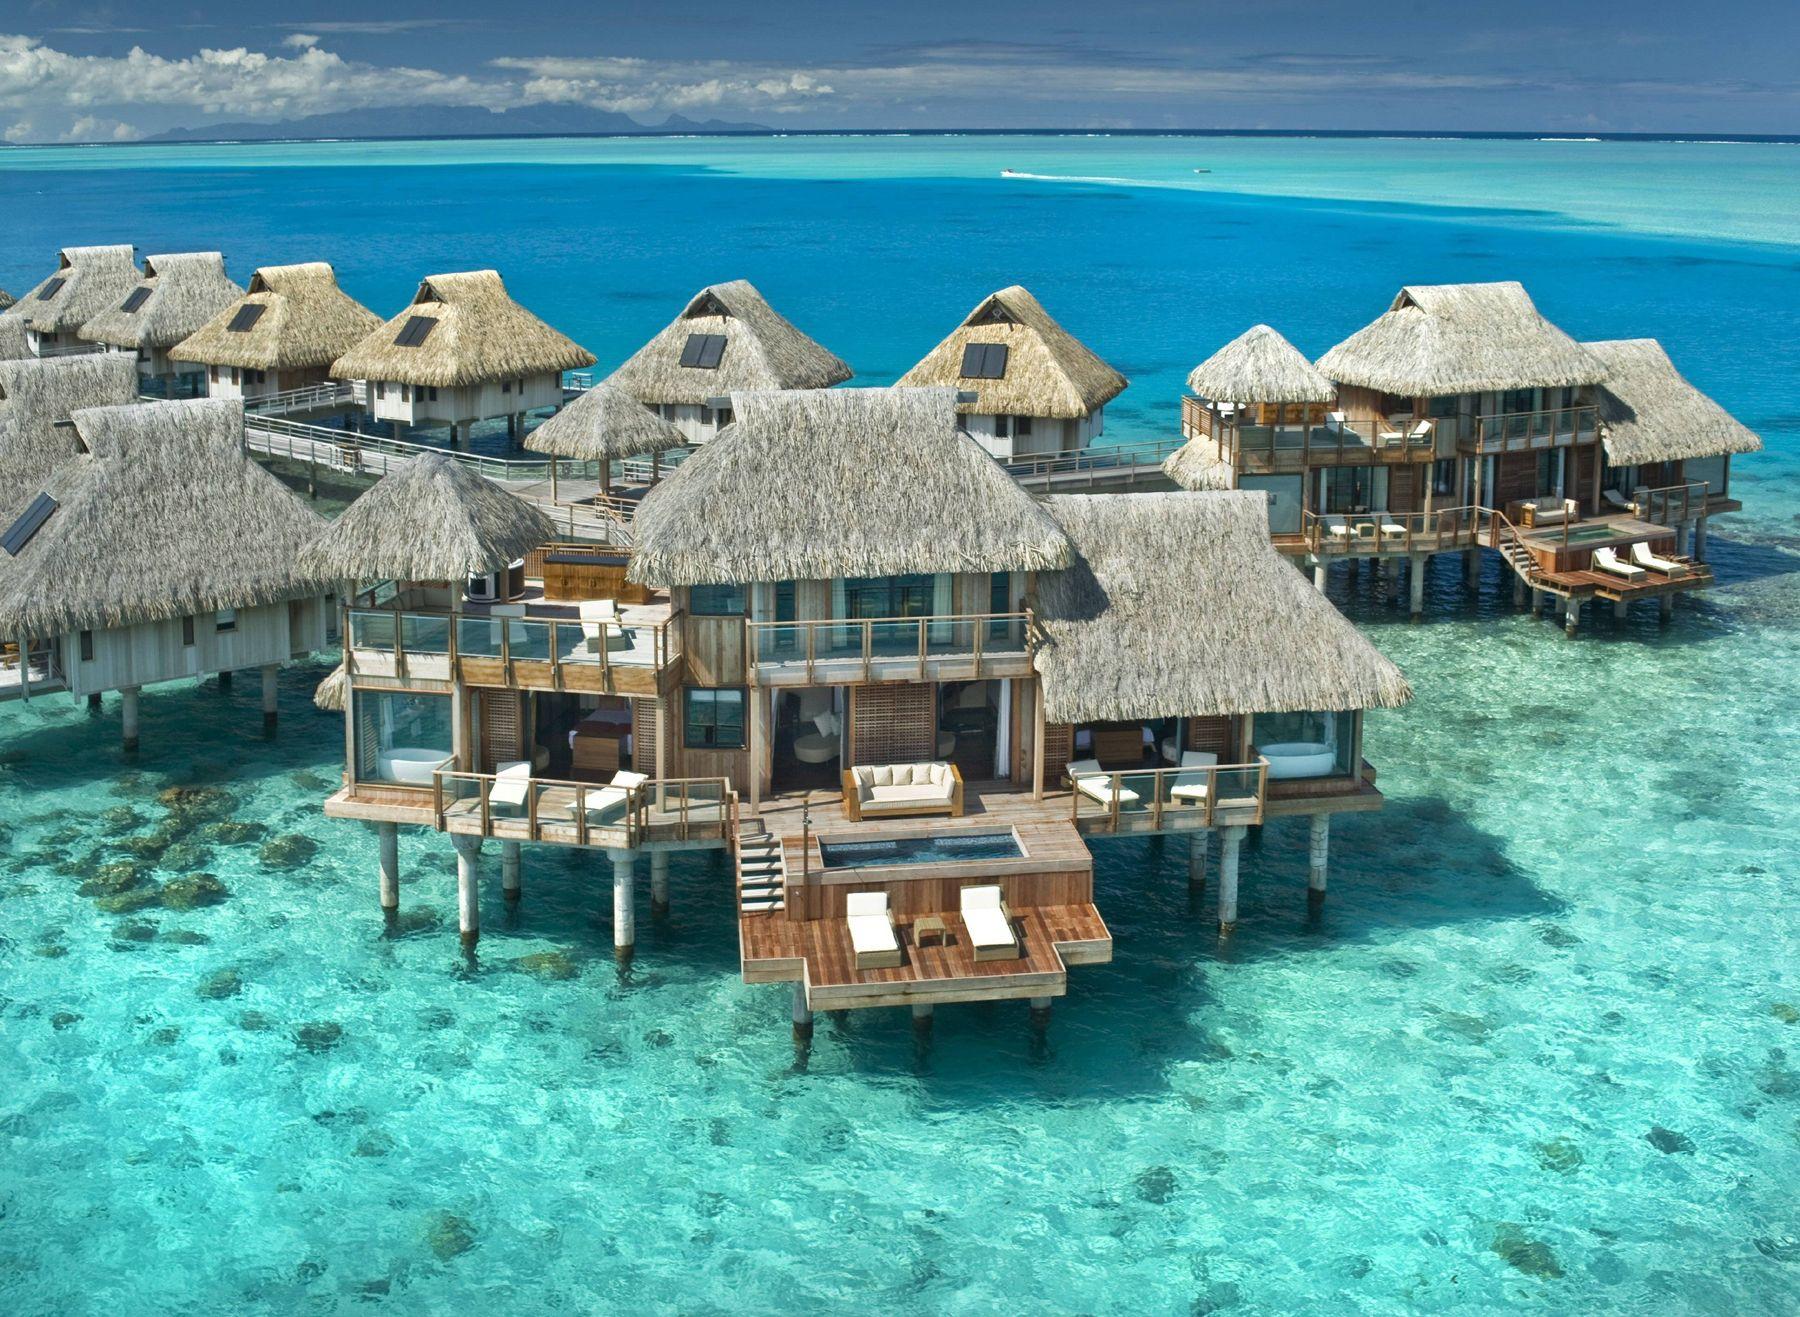 Bora Bora Island Tahiti French Polynesia Tourist Attractions Island Borabora Tahiti Frenchpolynesia Overwater Bungalows Dream Vacations Places To Go